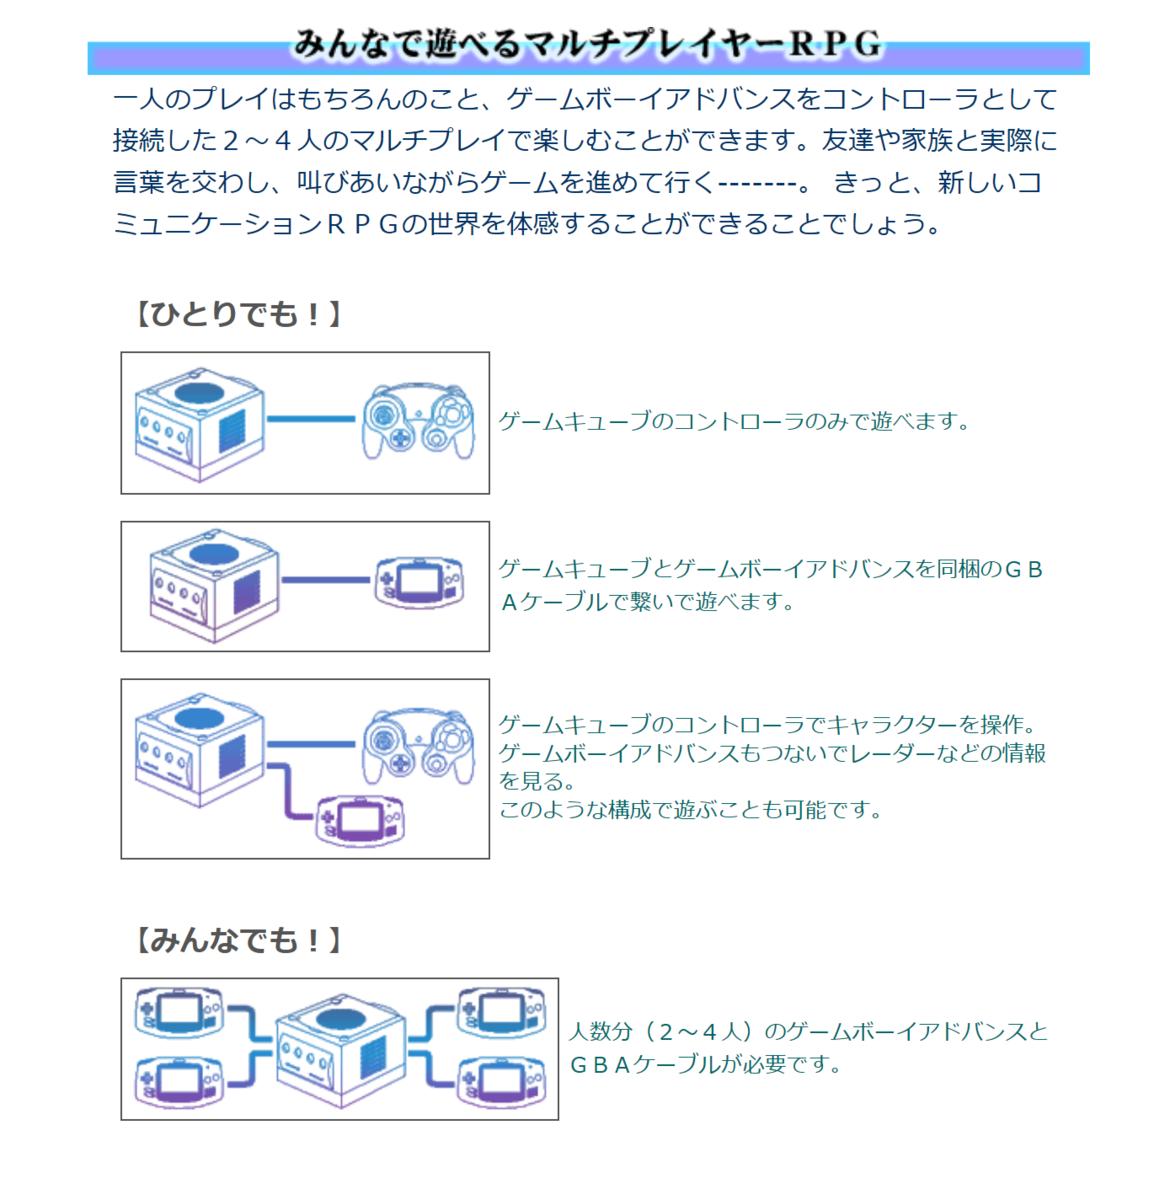 f:id:Boxthecompass:20200529131413p:plain